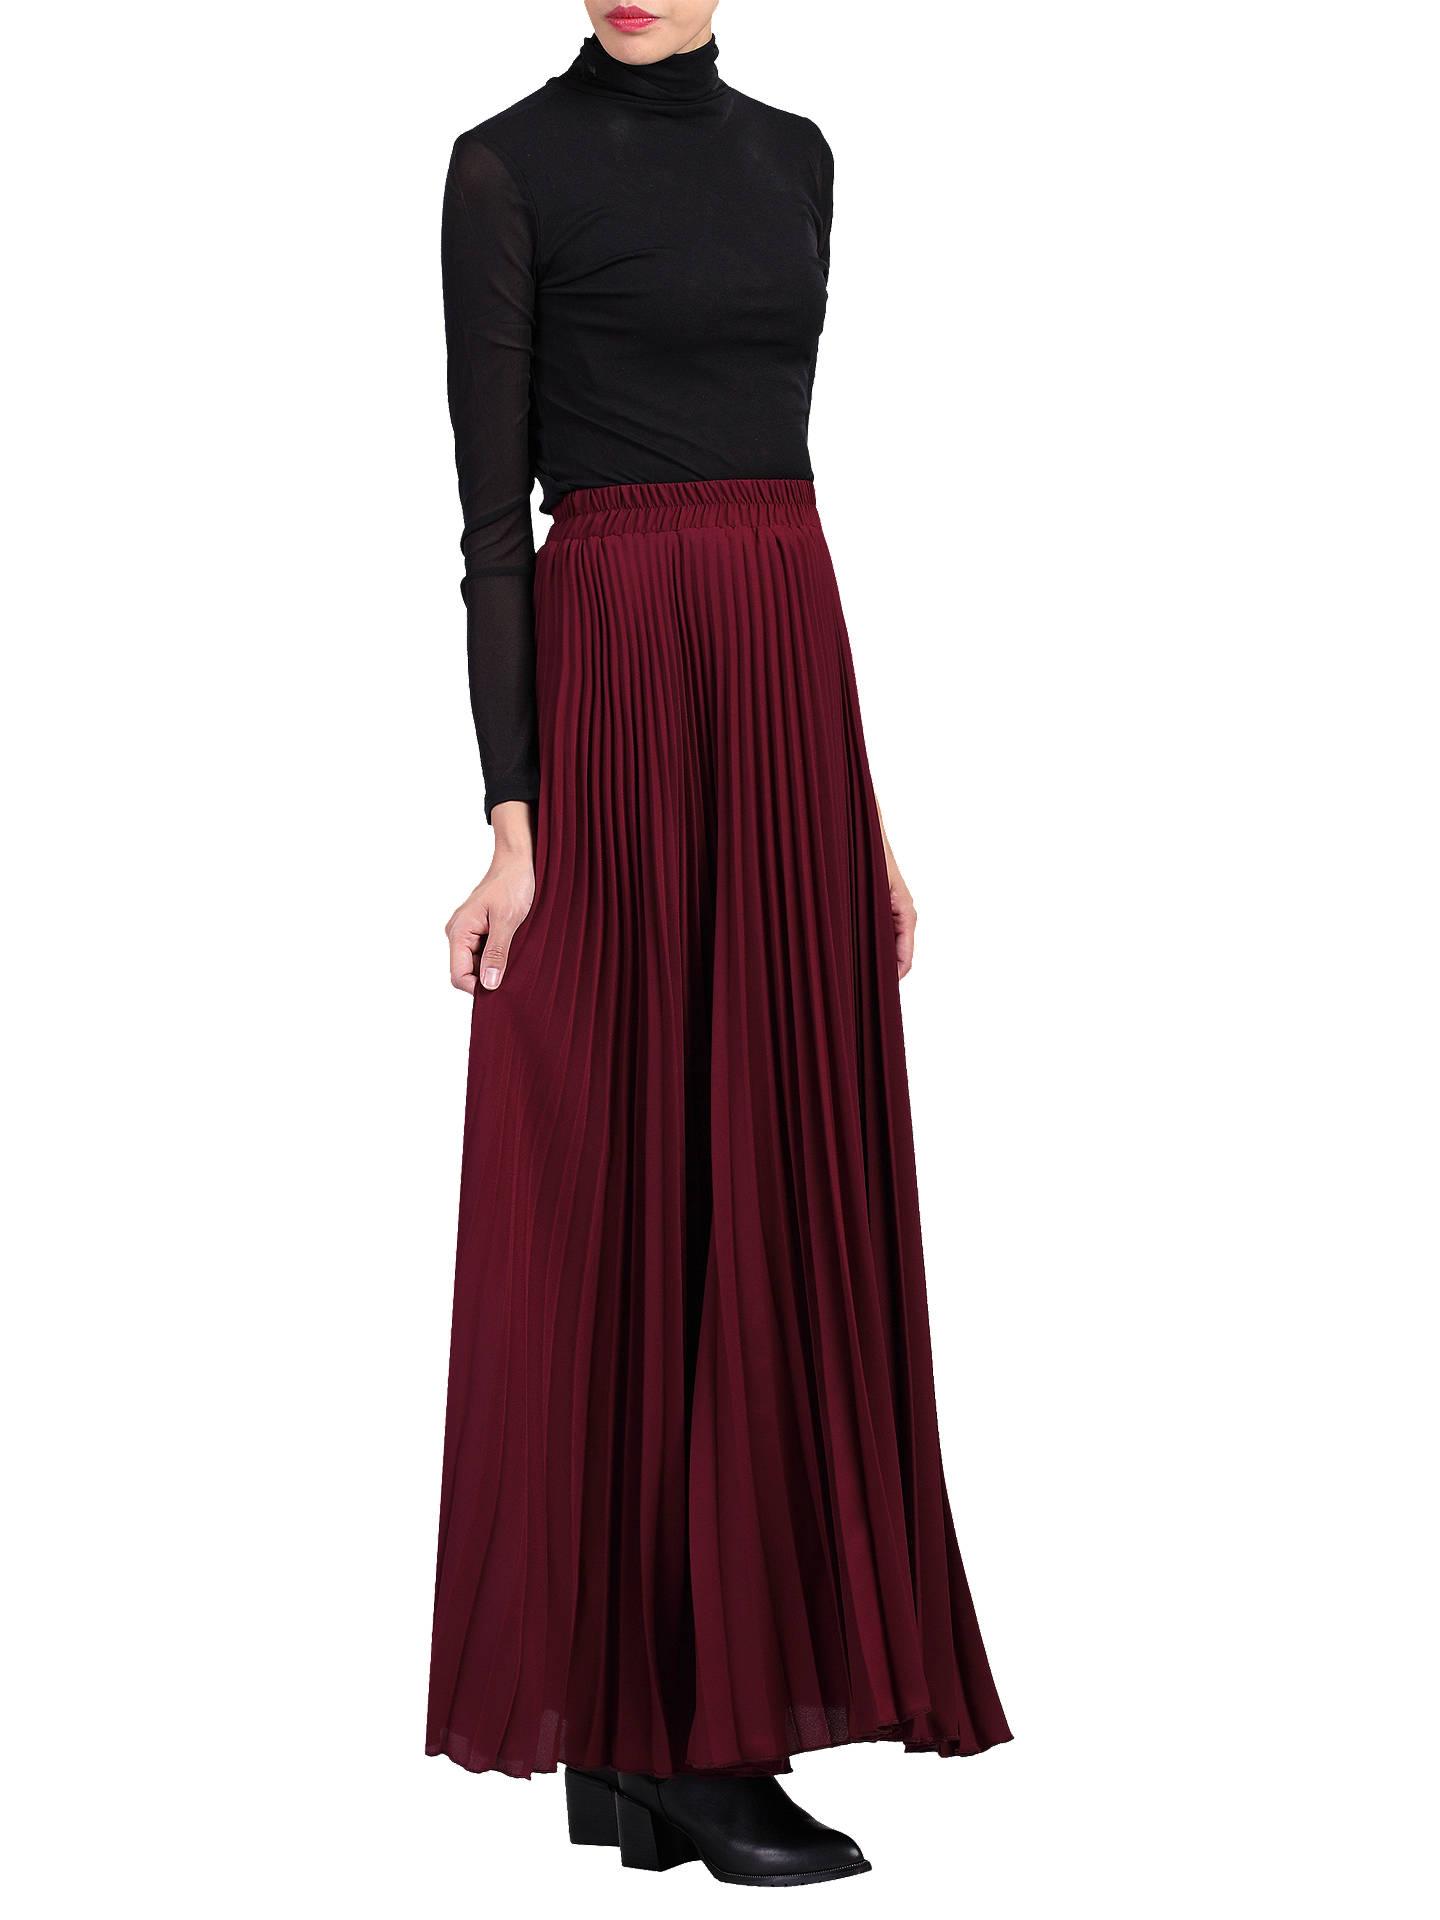 8b405ba061 ... Buy Jolie Moi Pleated Crepe Maxi Skirt, Burgundy, 8 Online at  johnlewis.com ...